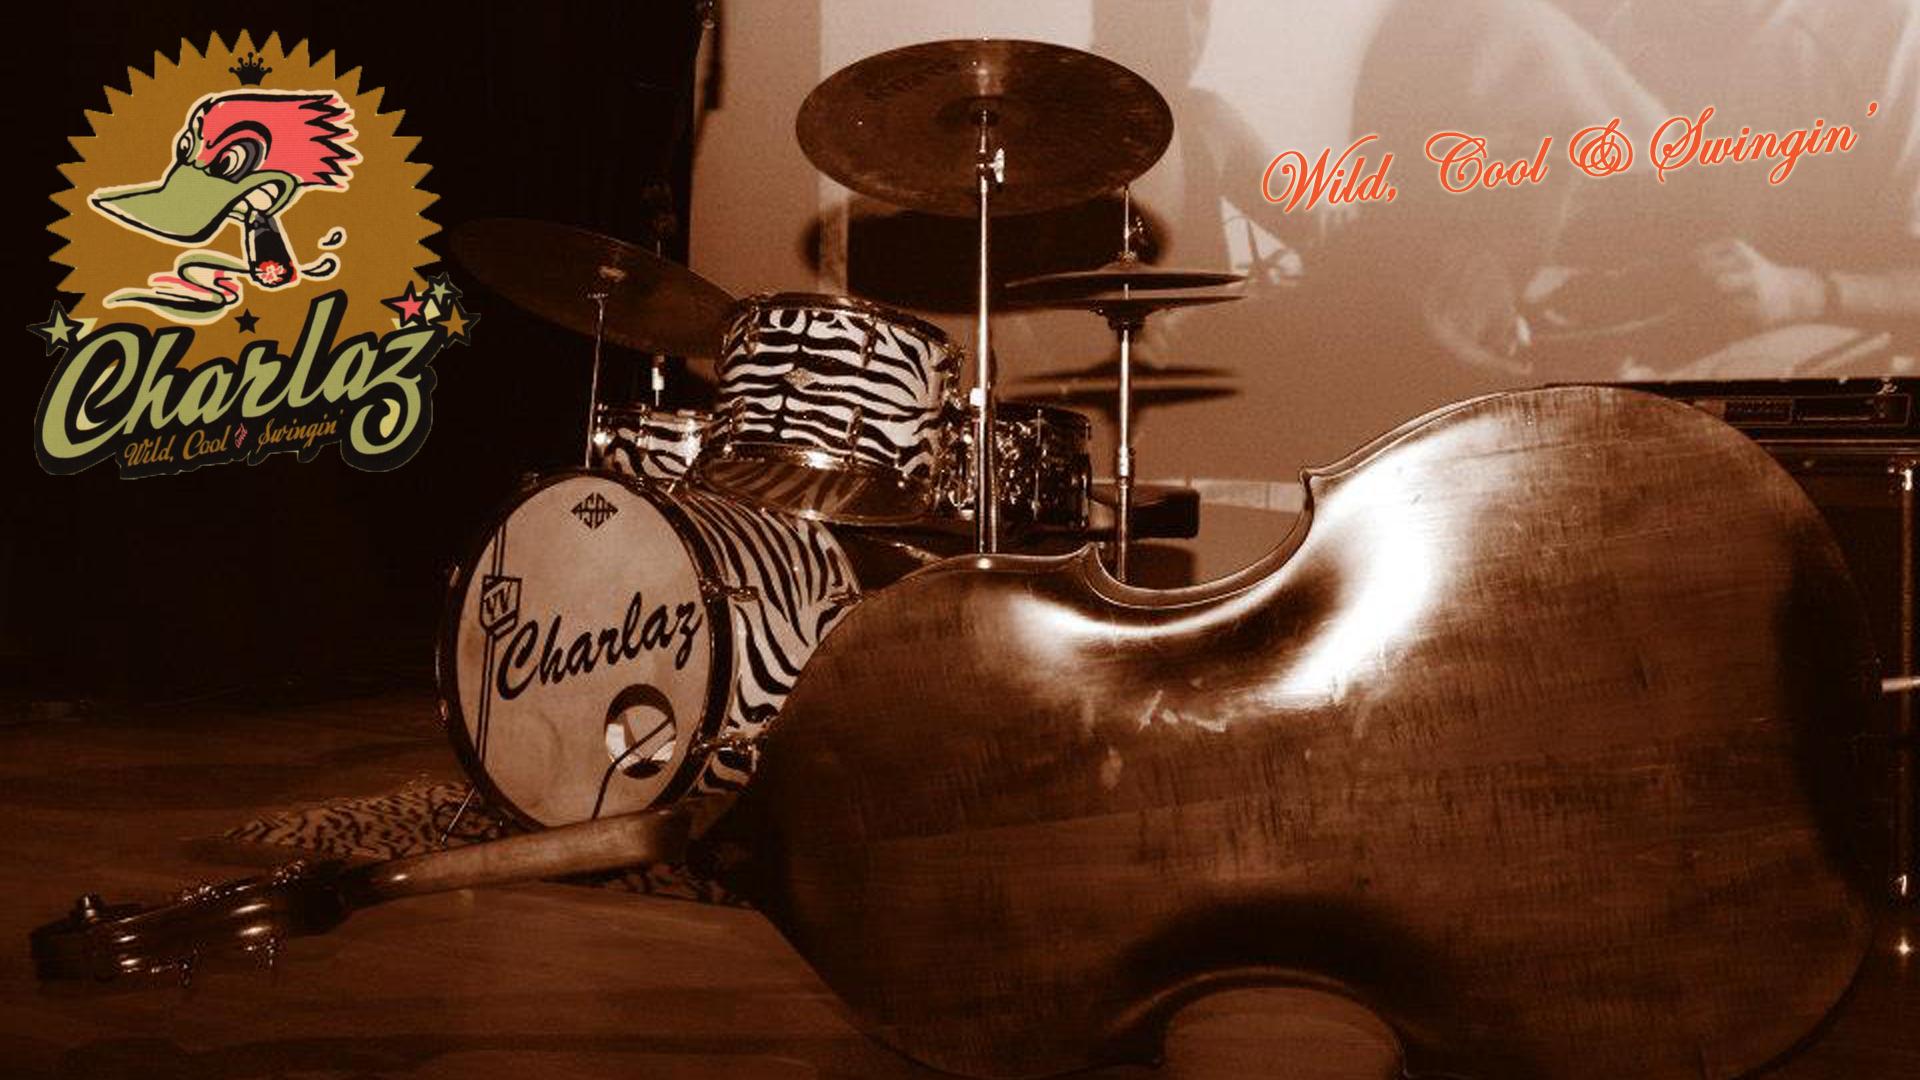 Les Charlaz (Wild, Cool & Swingin')